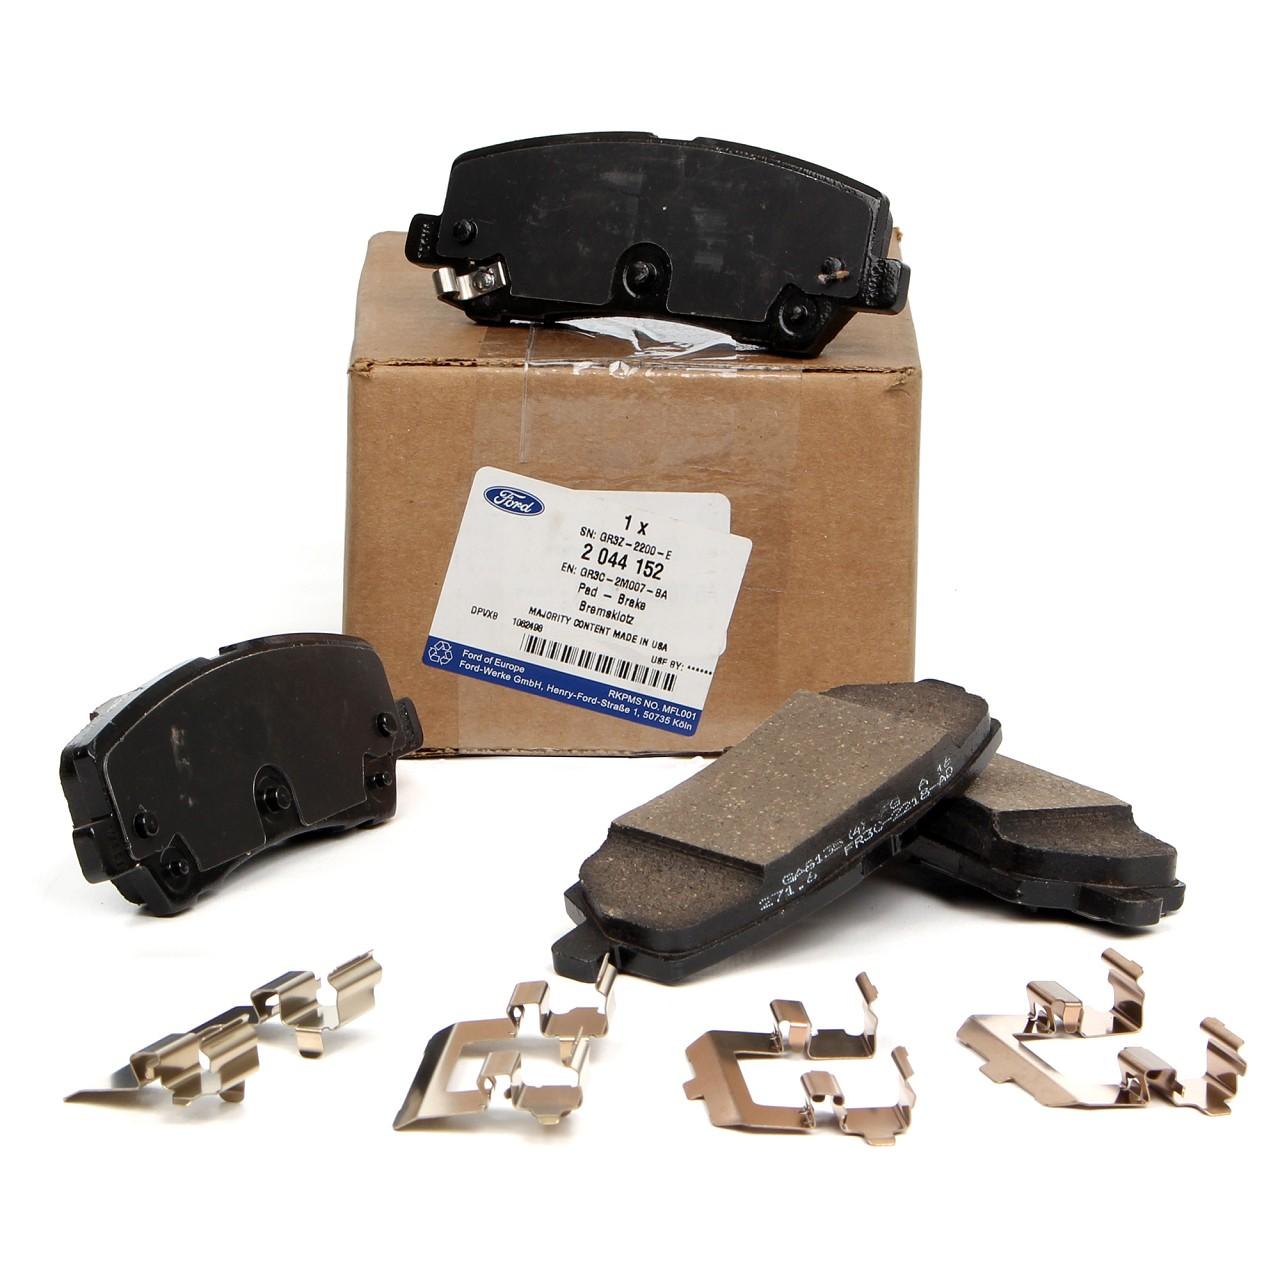 ORIGINAL Ford USA Bremsbeläge Bremsbelagsatz MUSTANG ab 07.2015 hinten 2044152